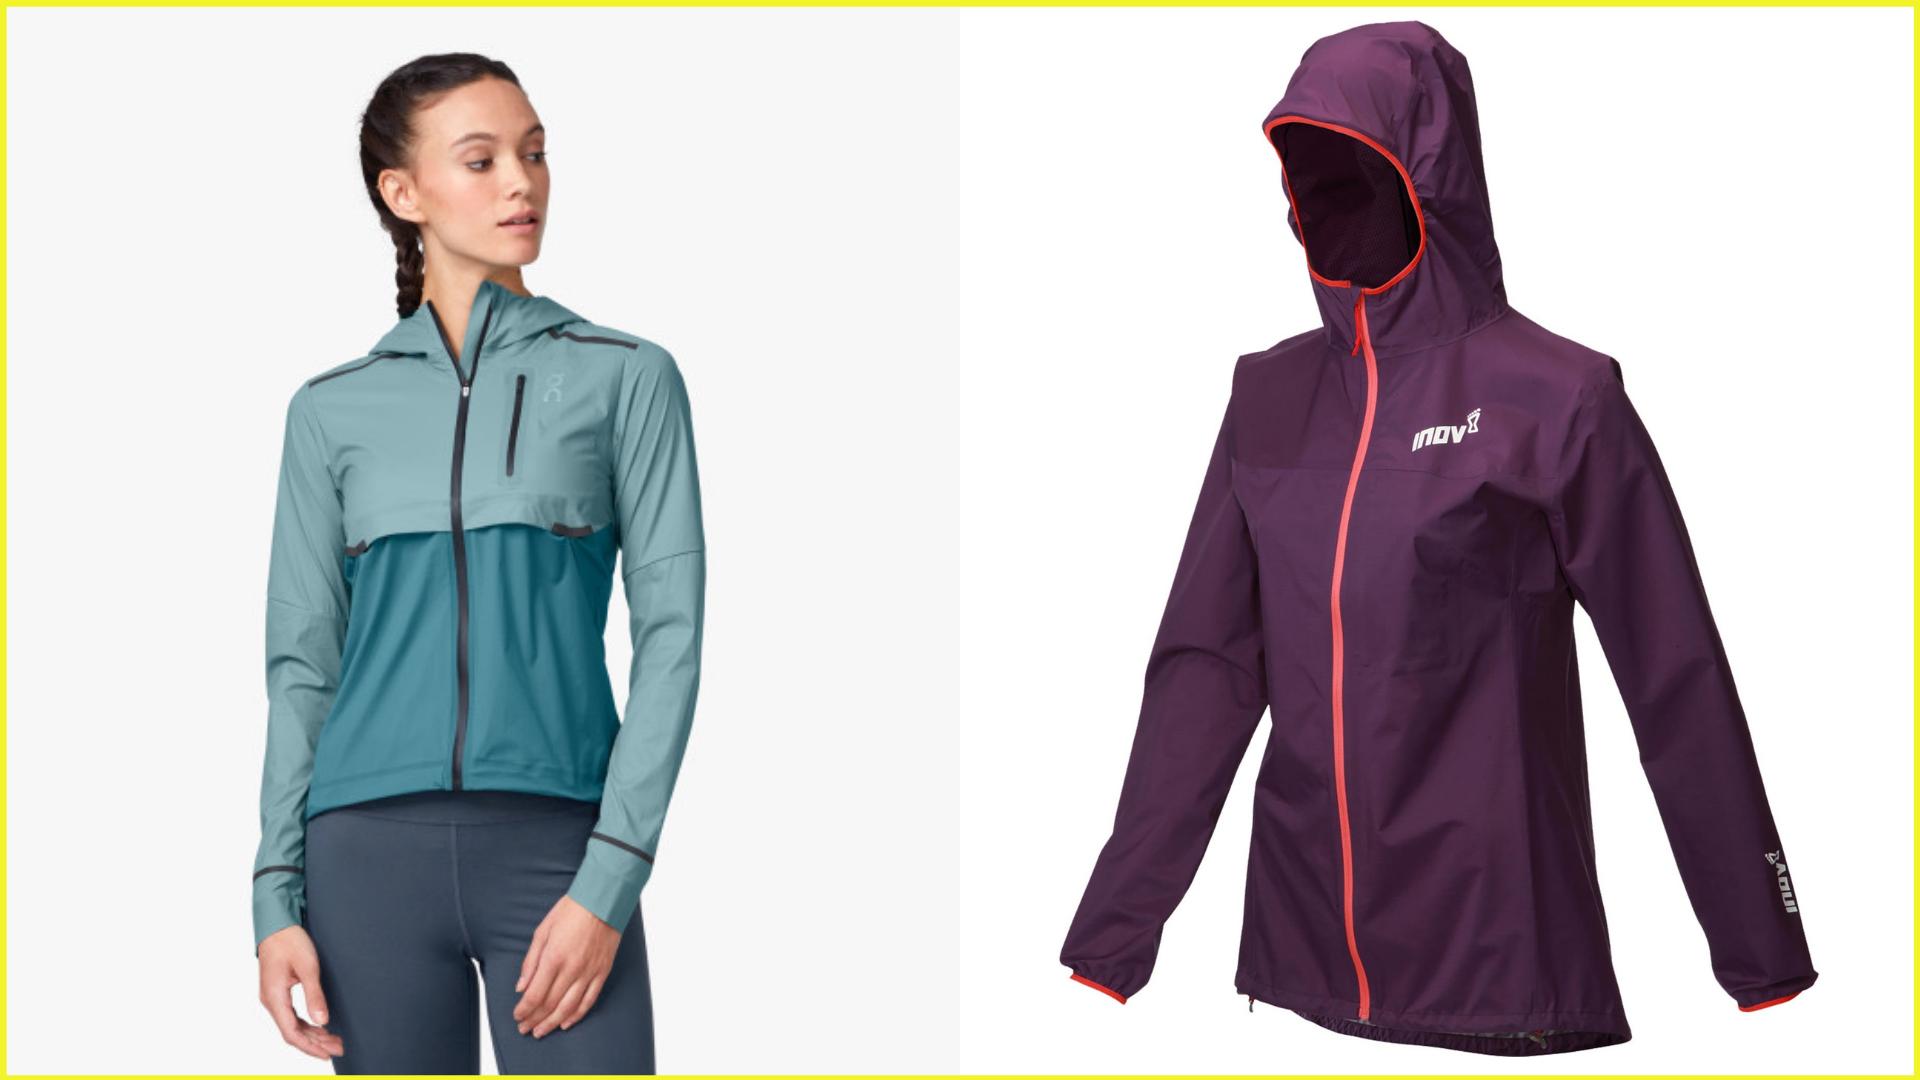 Women's Hardshell Jackets